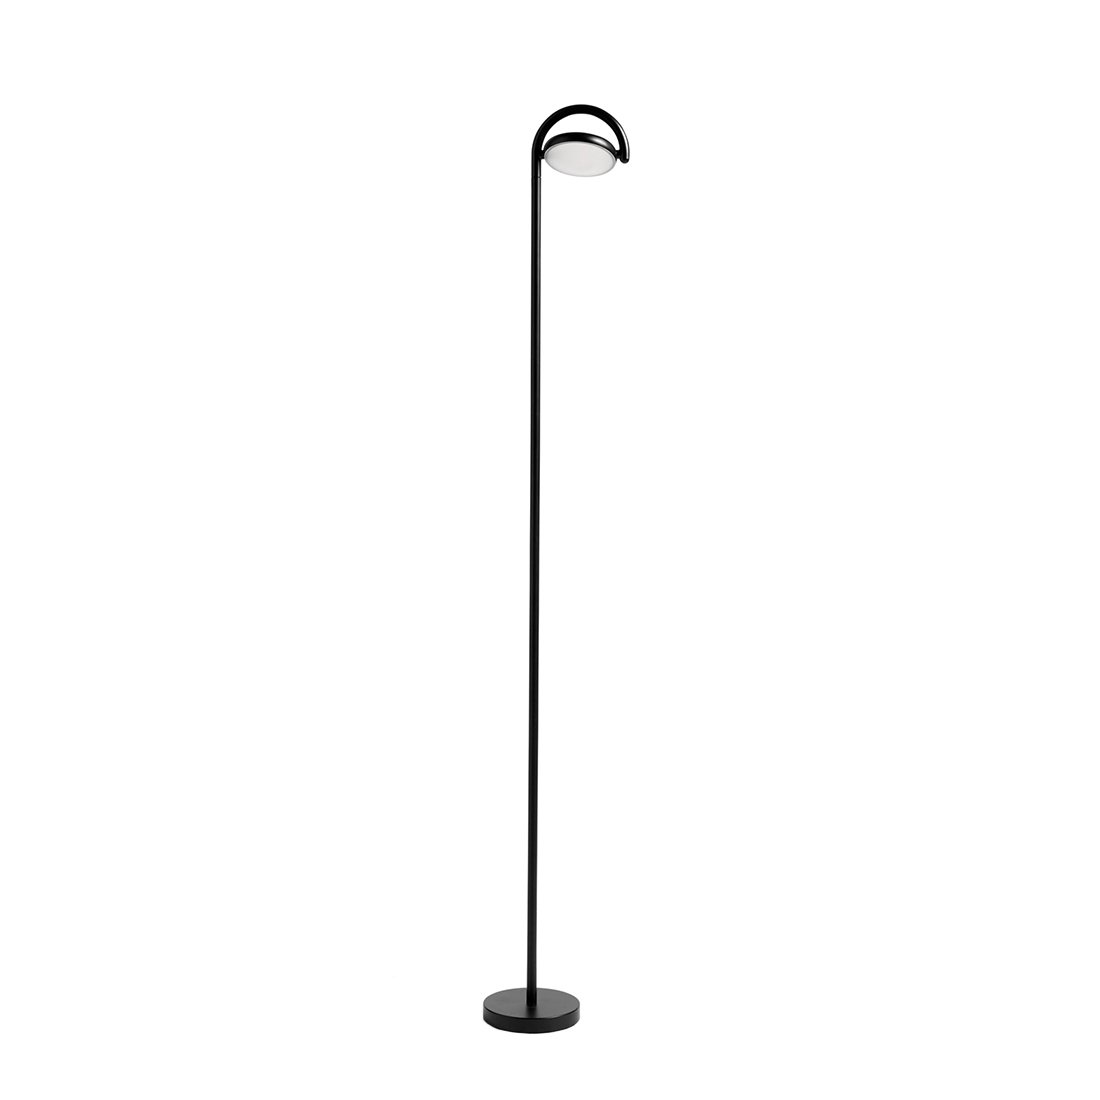 HAY Marselis Vloerlamp - Zacht Zwart